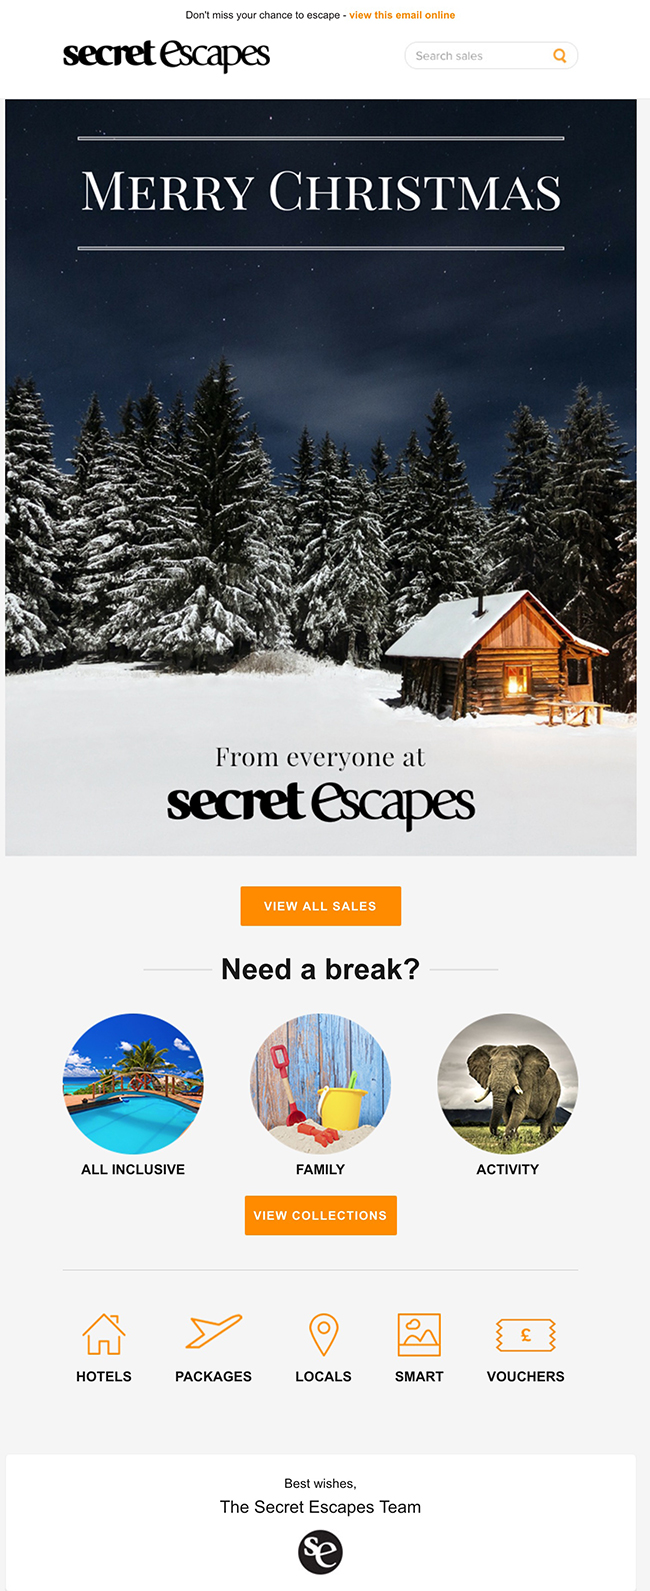 Secret escapes holiday trip newsletter